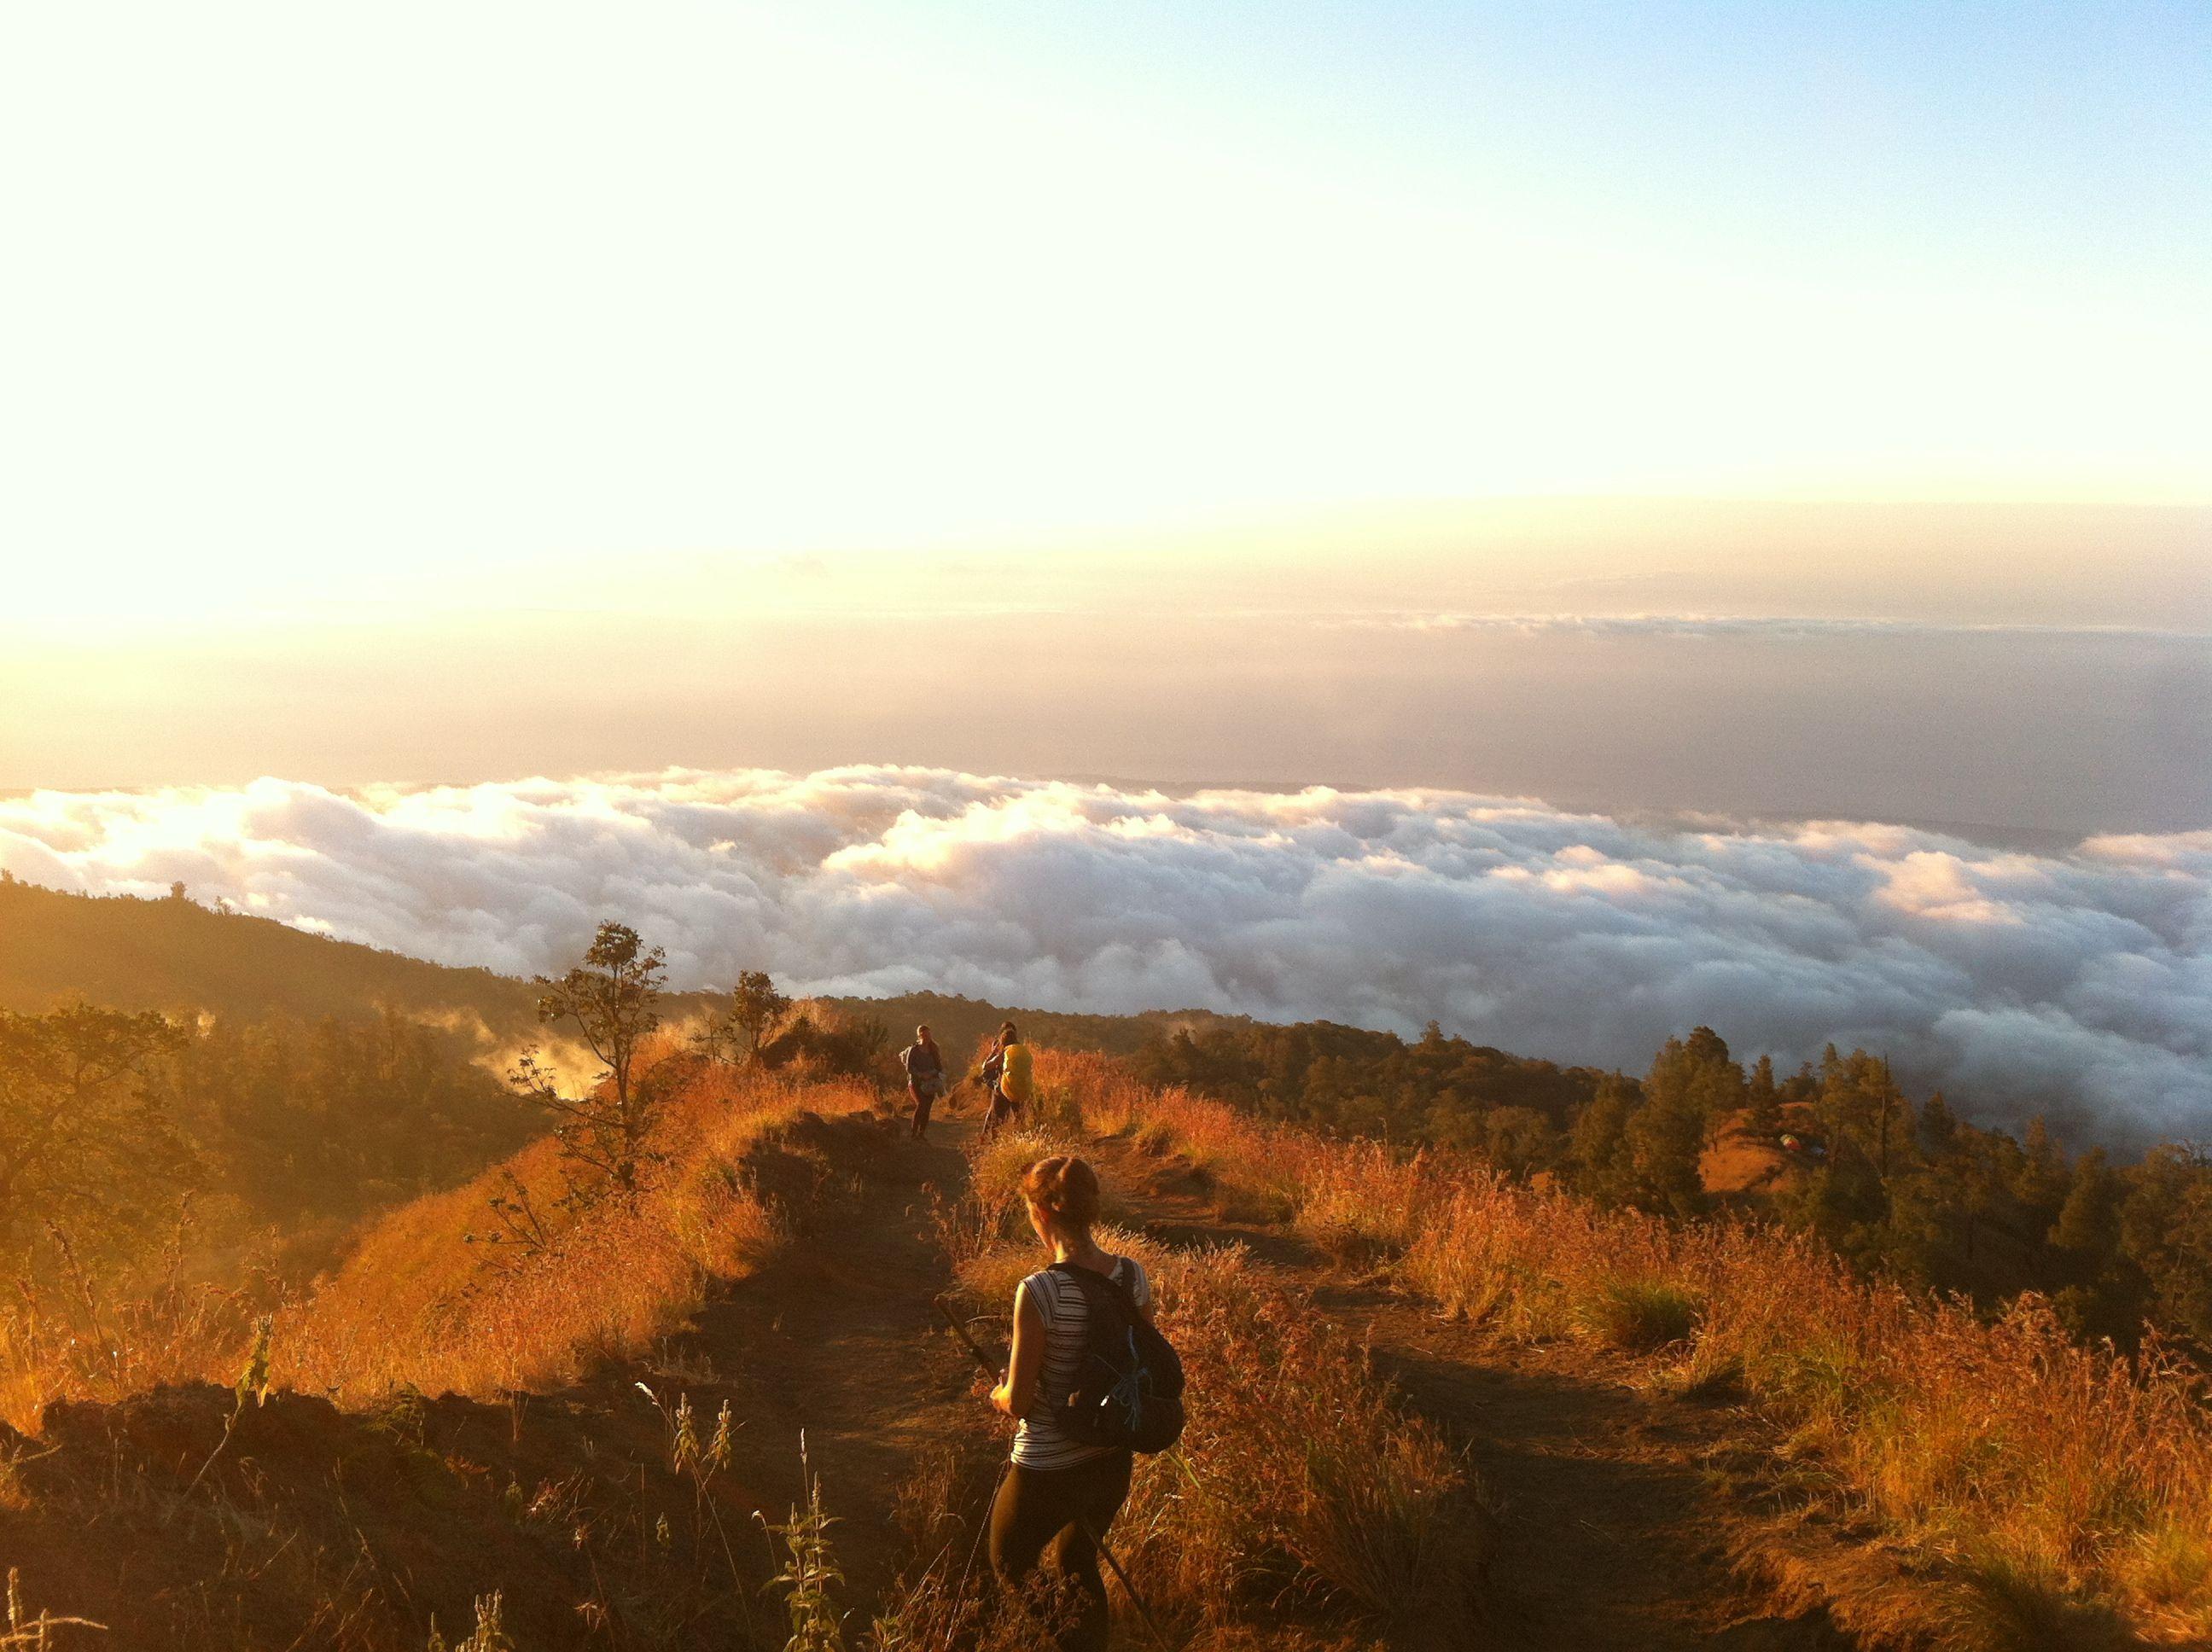 Mt Rinjani rim, Lombok, Indonesia